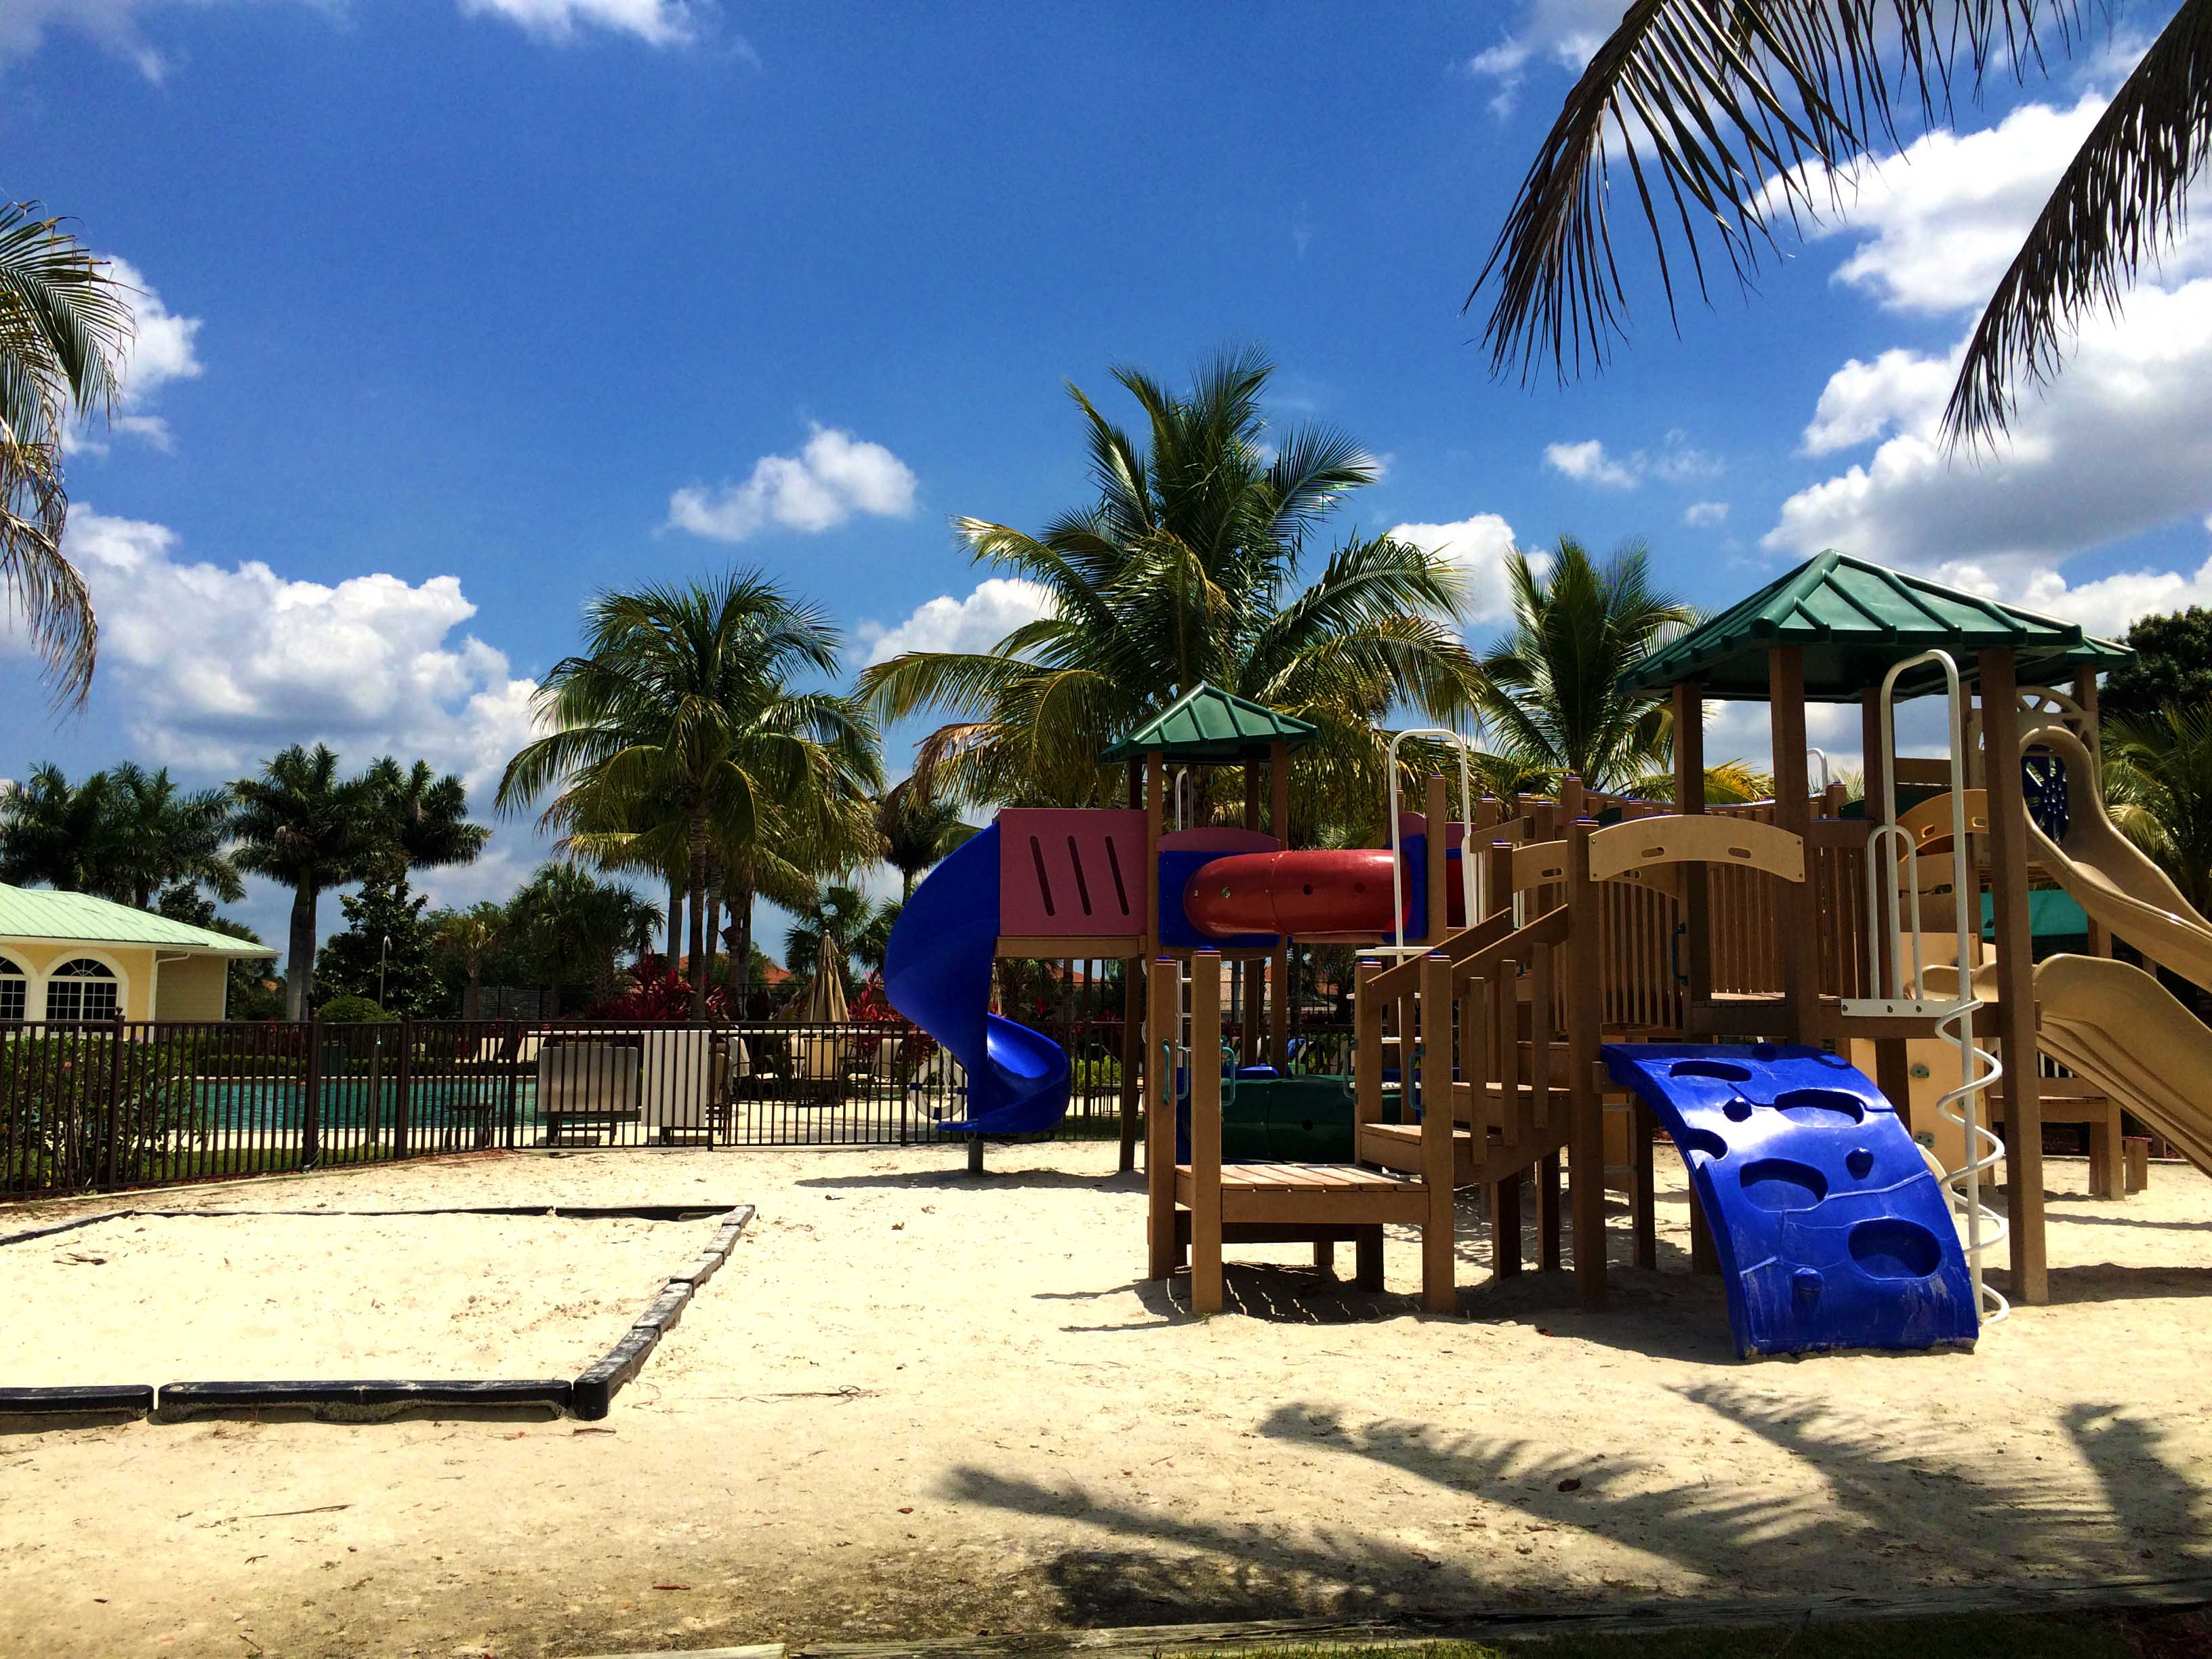 fort-myers-amenities-moody-river-playground.jpg